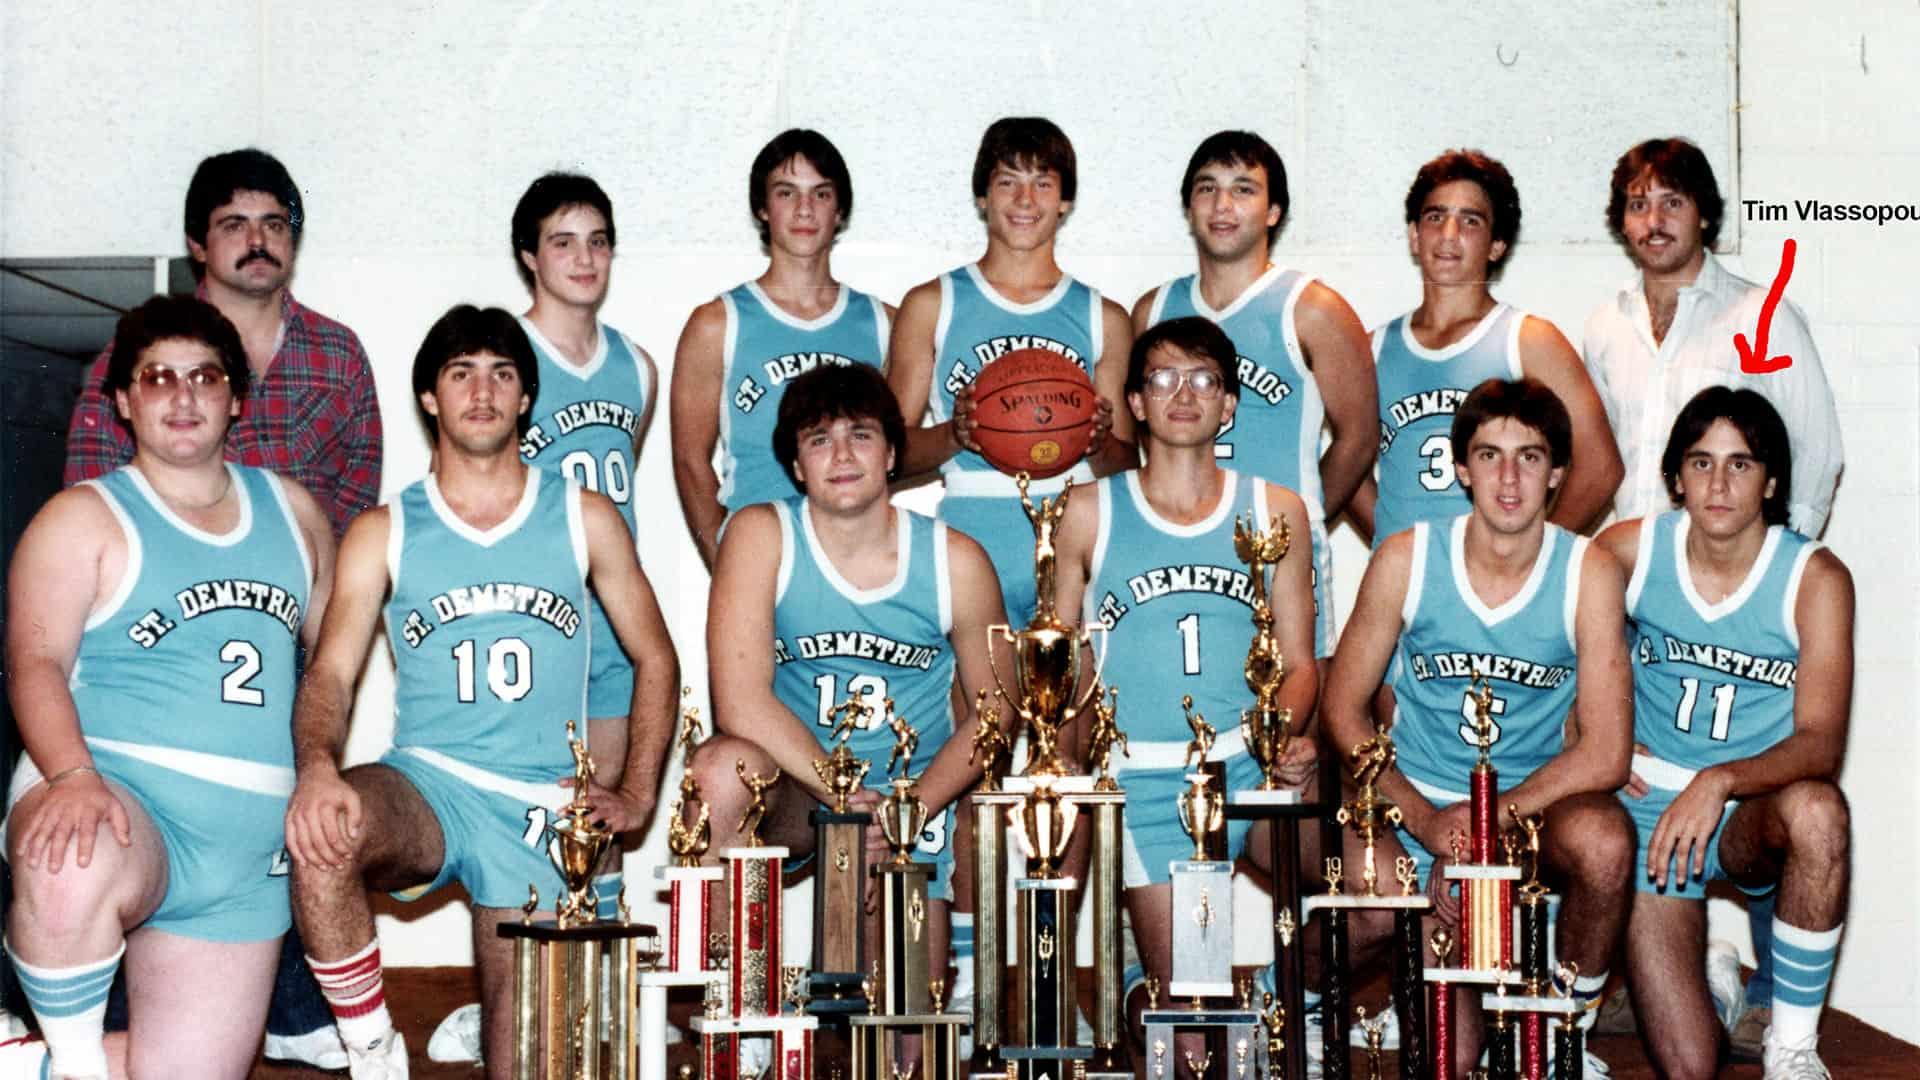 1983 GOYA National Basketball Champions, St. Demetrios of Upper Darby